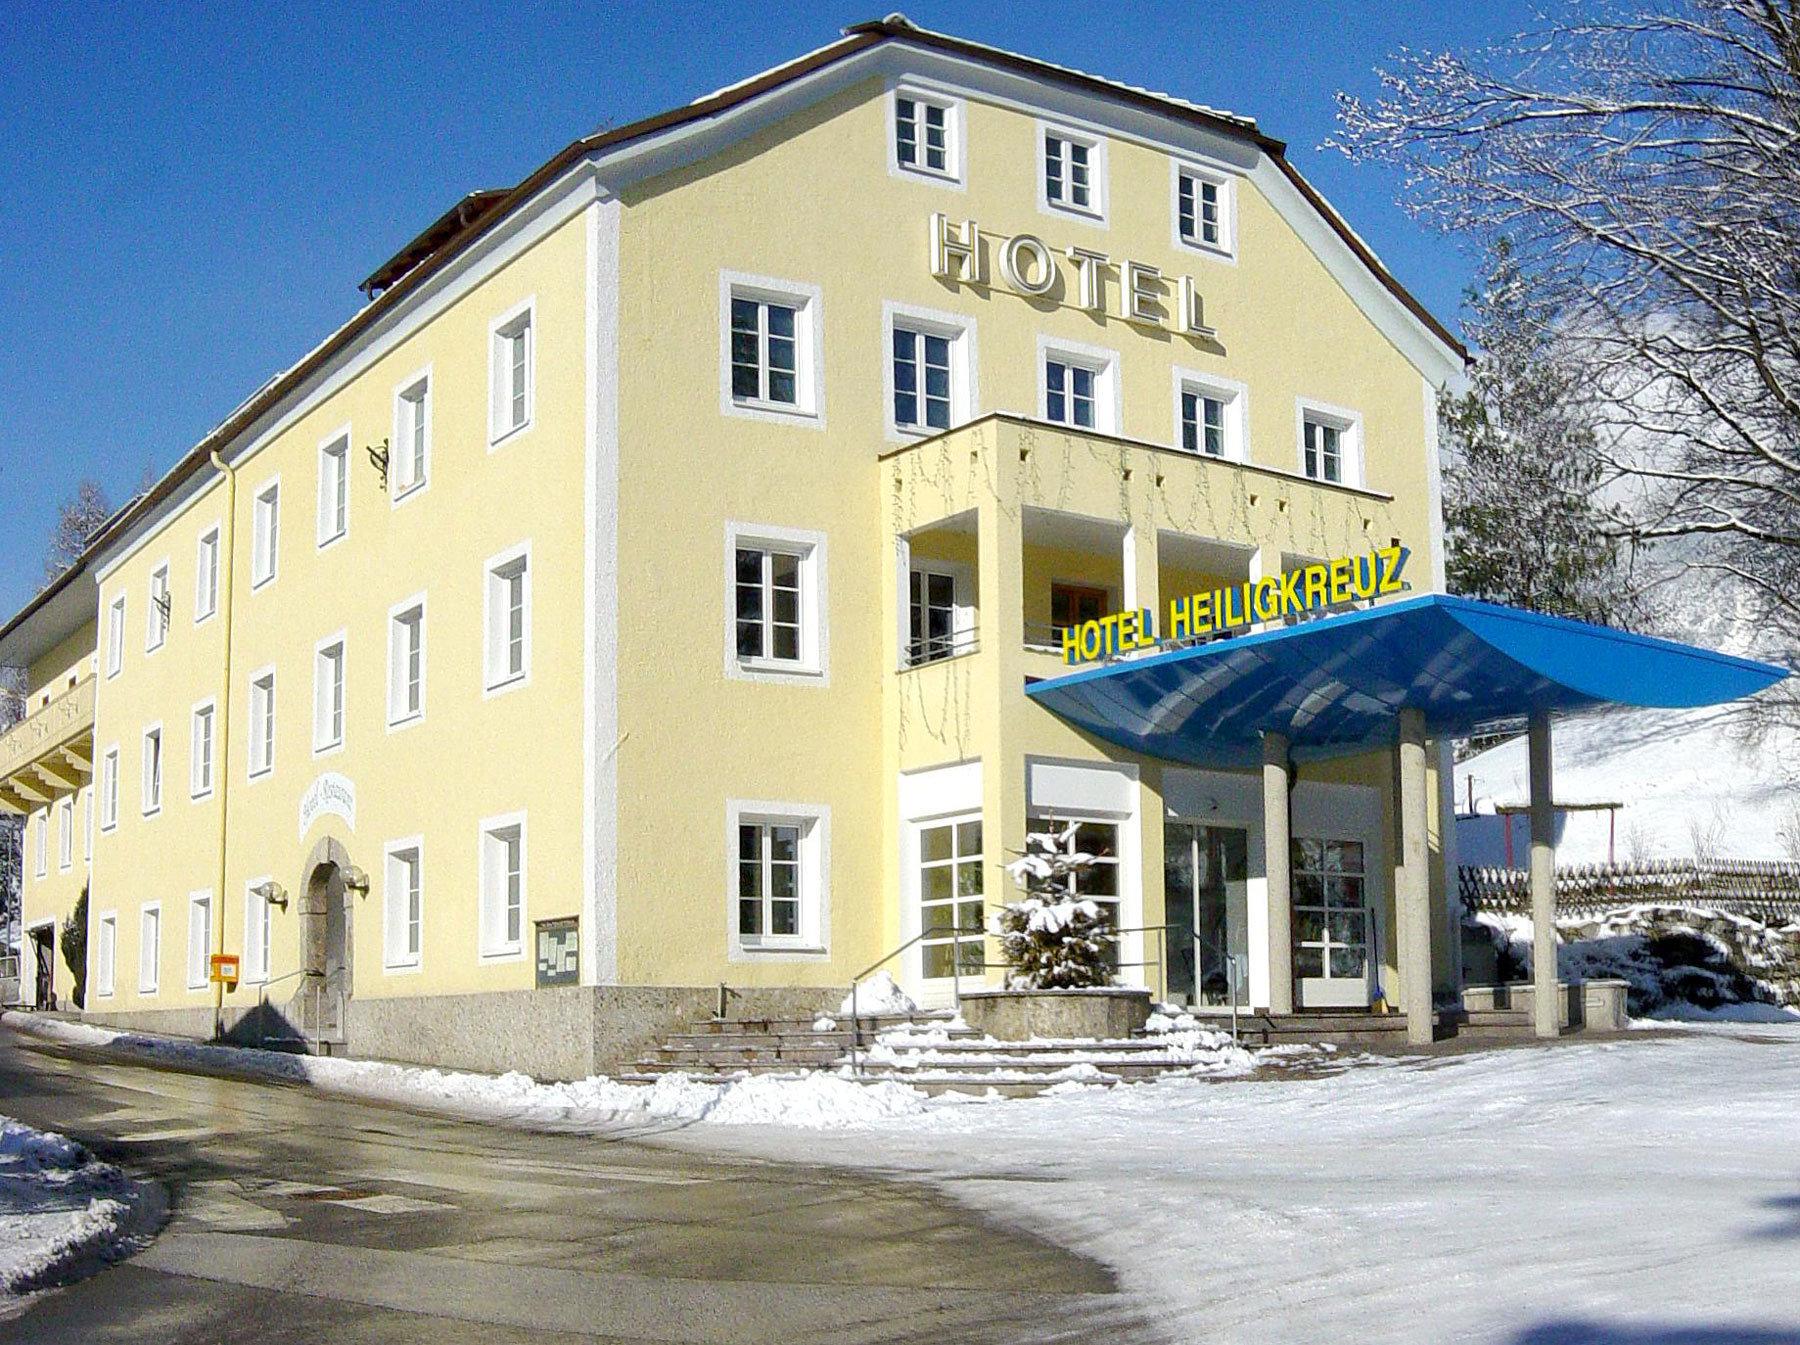 Hotel Heiligkreuz 2010